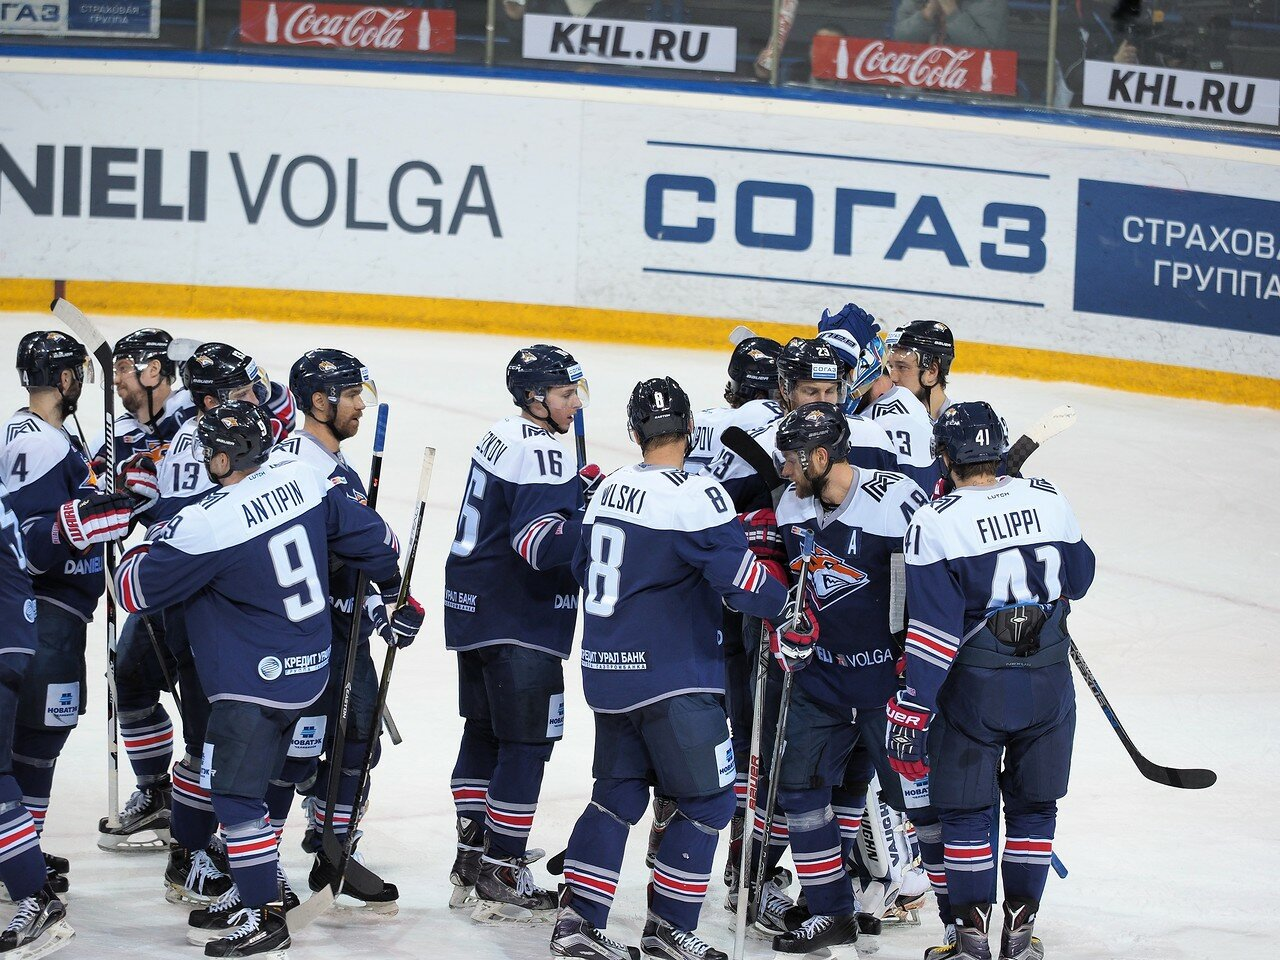 66Плей-офф 2016 Восток Финал Металлург - Салават Юлаев 25.03.2016